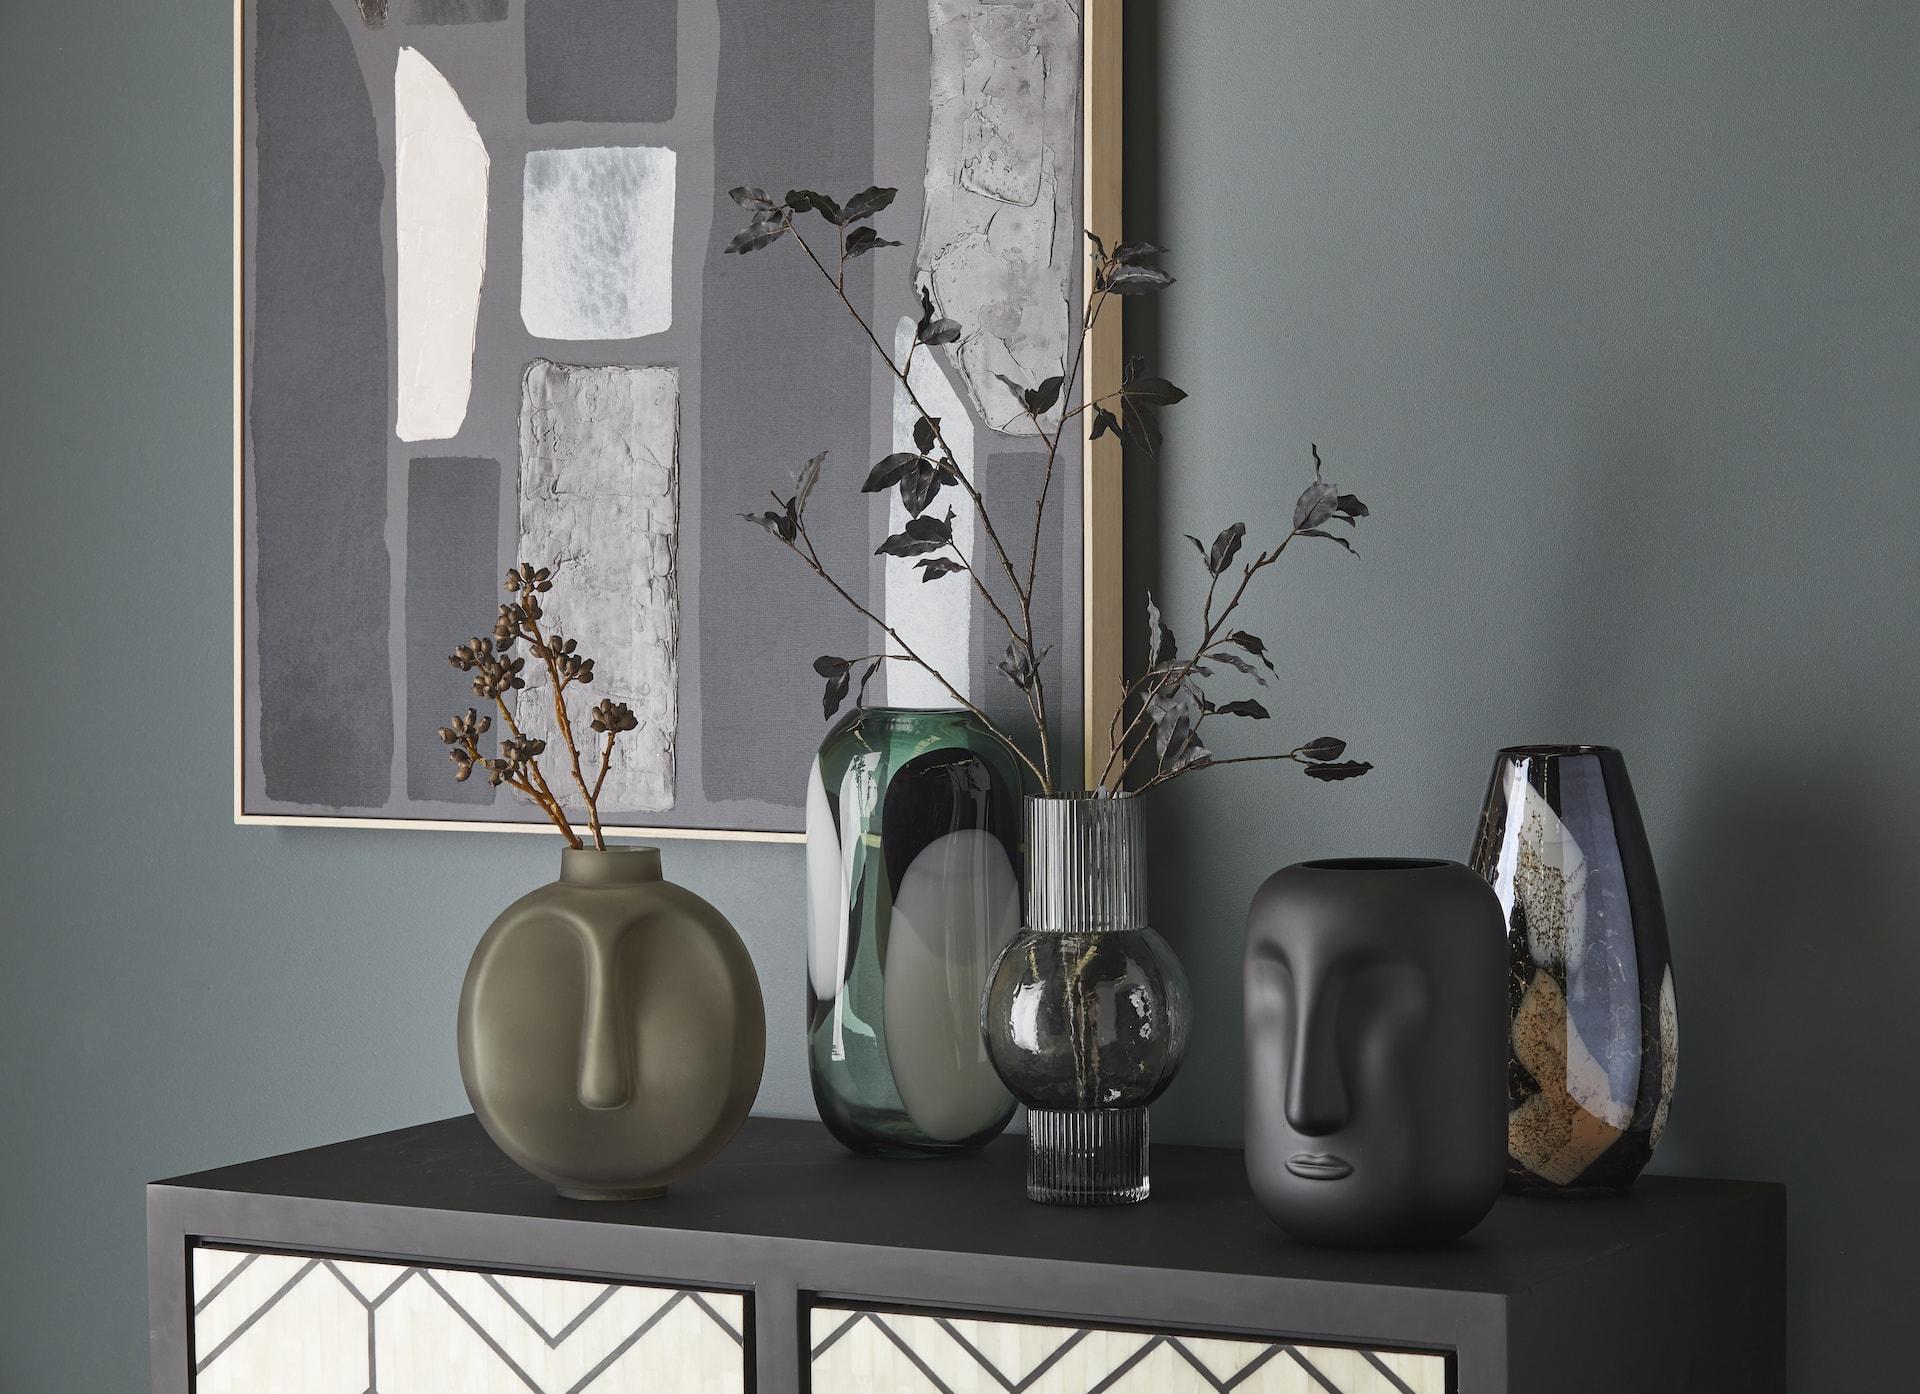 black and green figure vase face decor face vases on sideboard